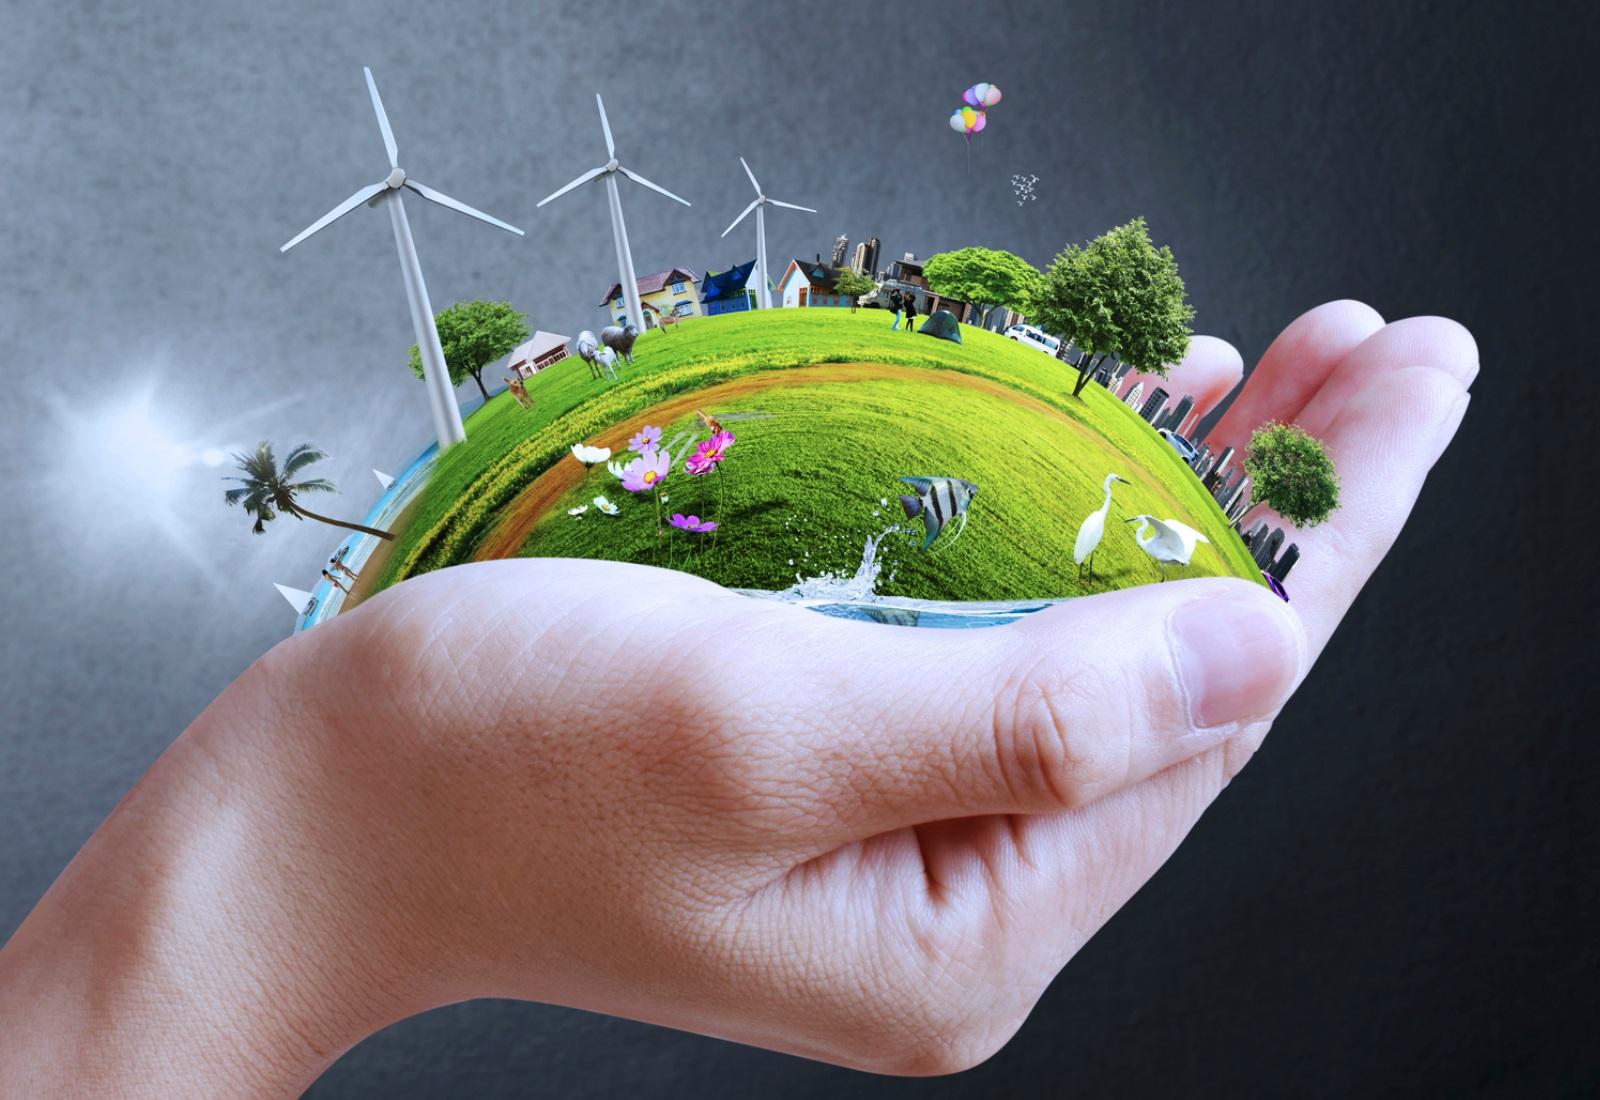 D veloppement durable valeo - Plafond livret developpement durable societe generale ...